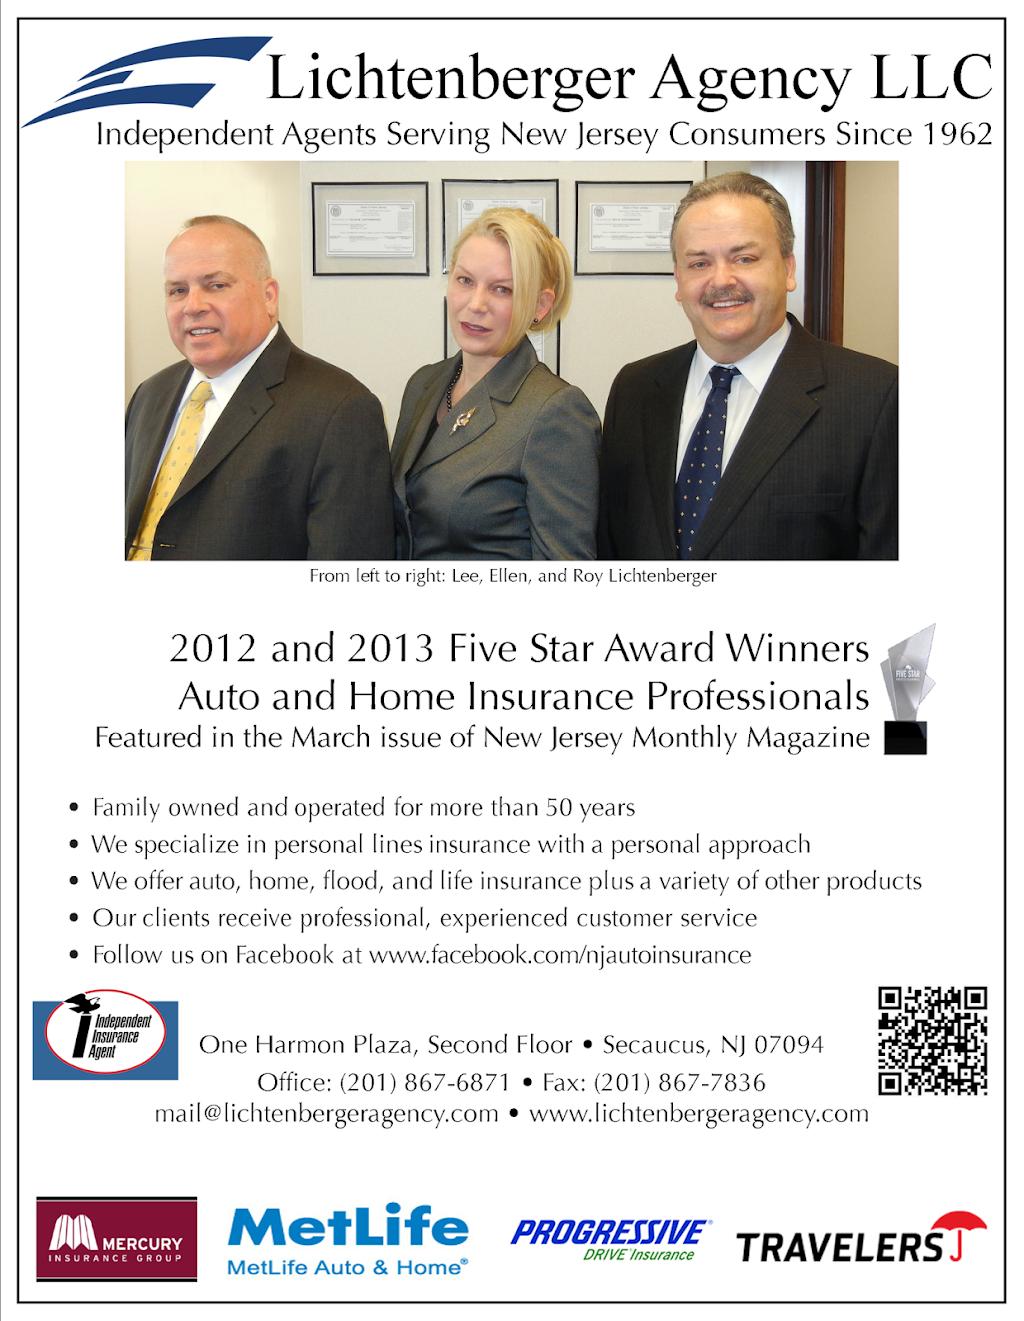 Lichtenberger Agency LLC - insurance agency  | Photo 3 of 6 | Address: Second Floor, One Harmon Plaza, Secaucus, NJ 07094, USA | Phone: (201) 867-6871